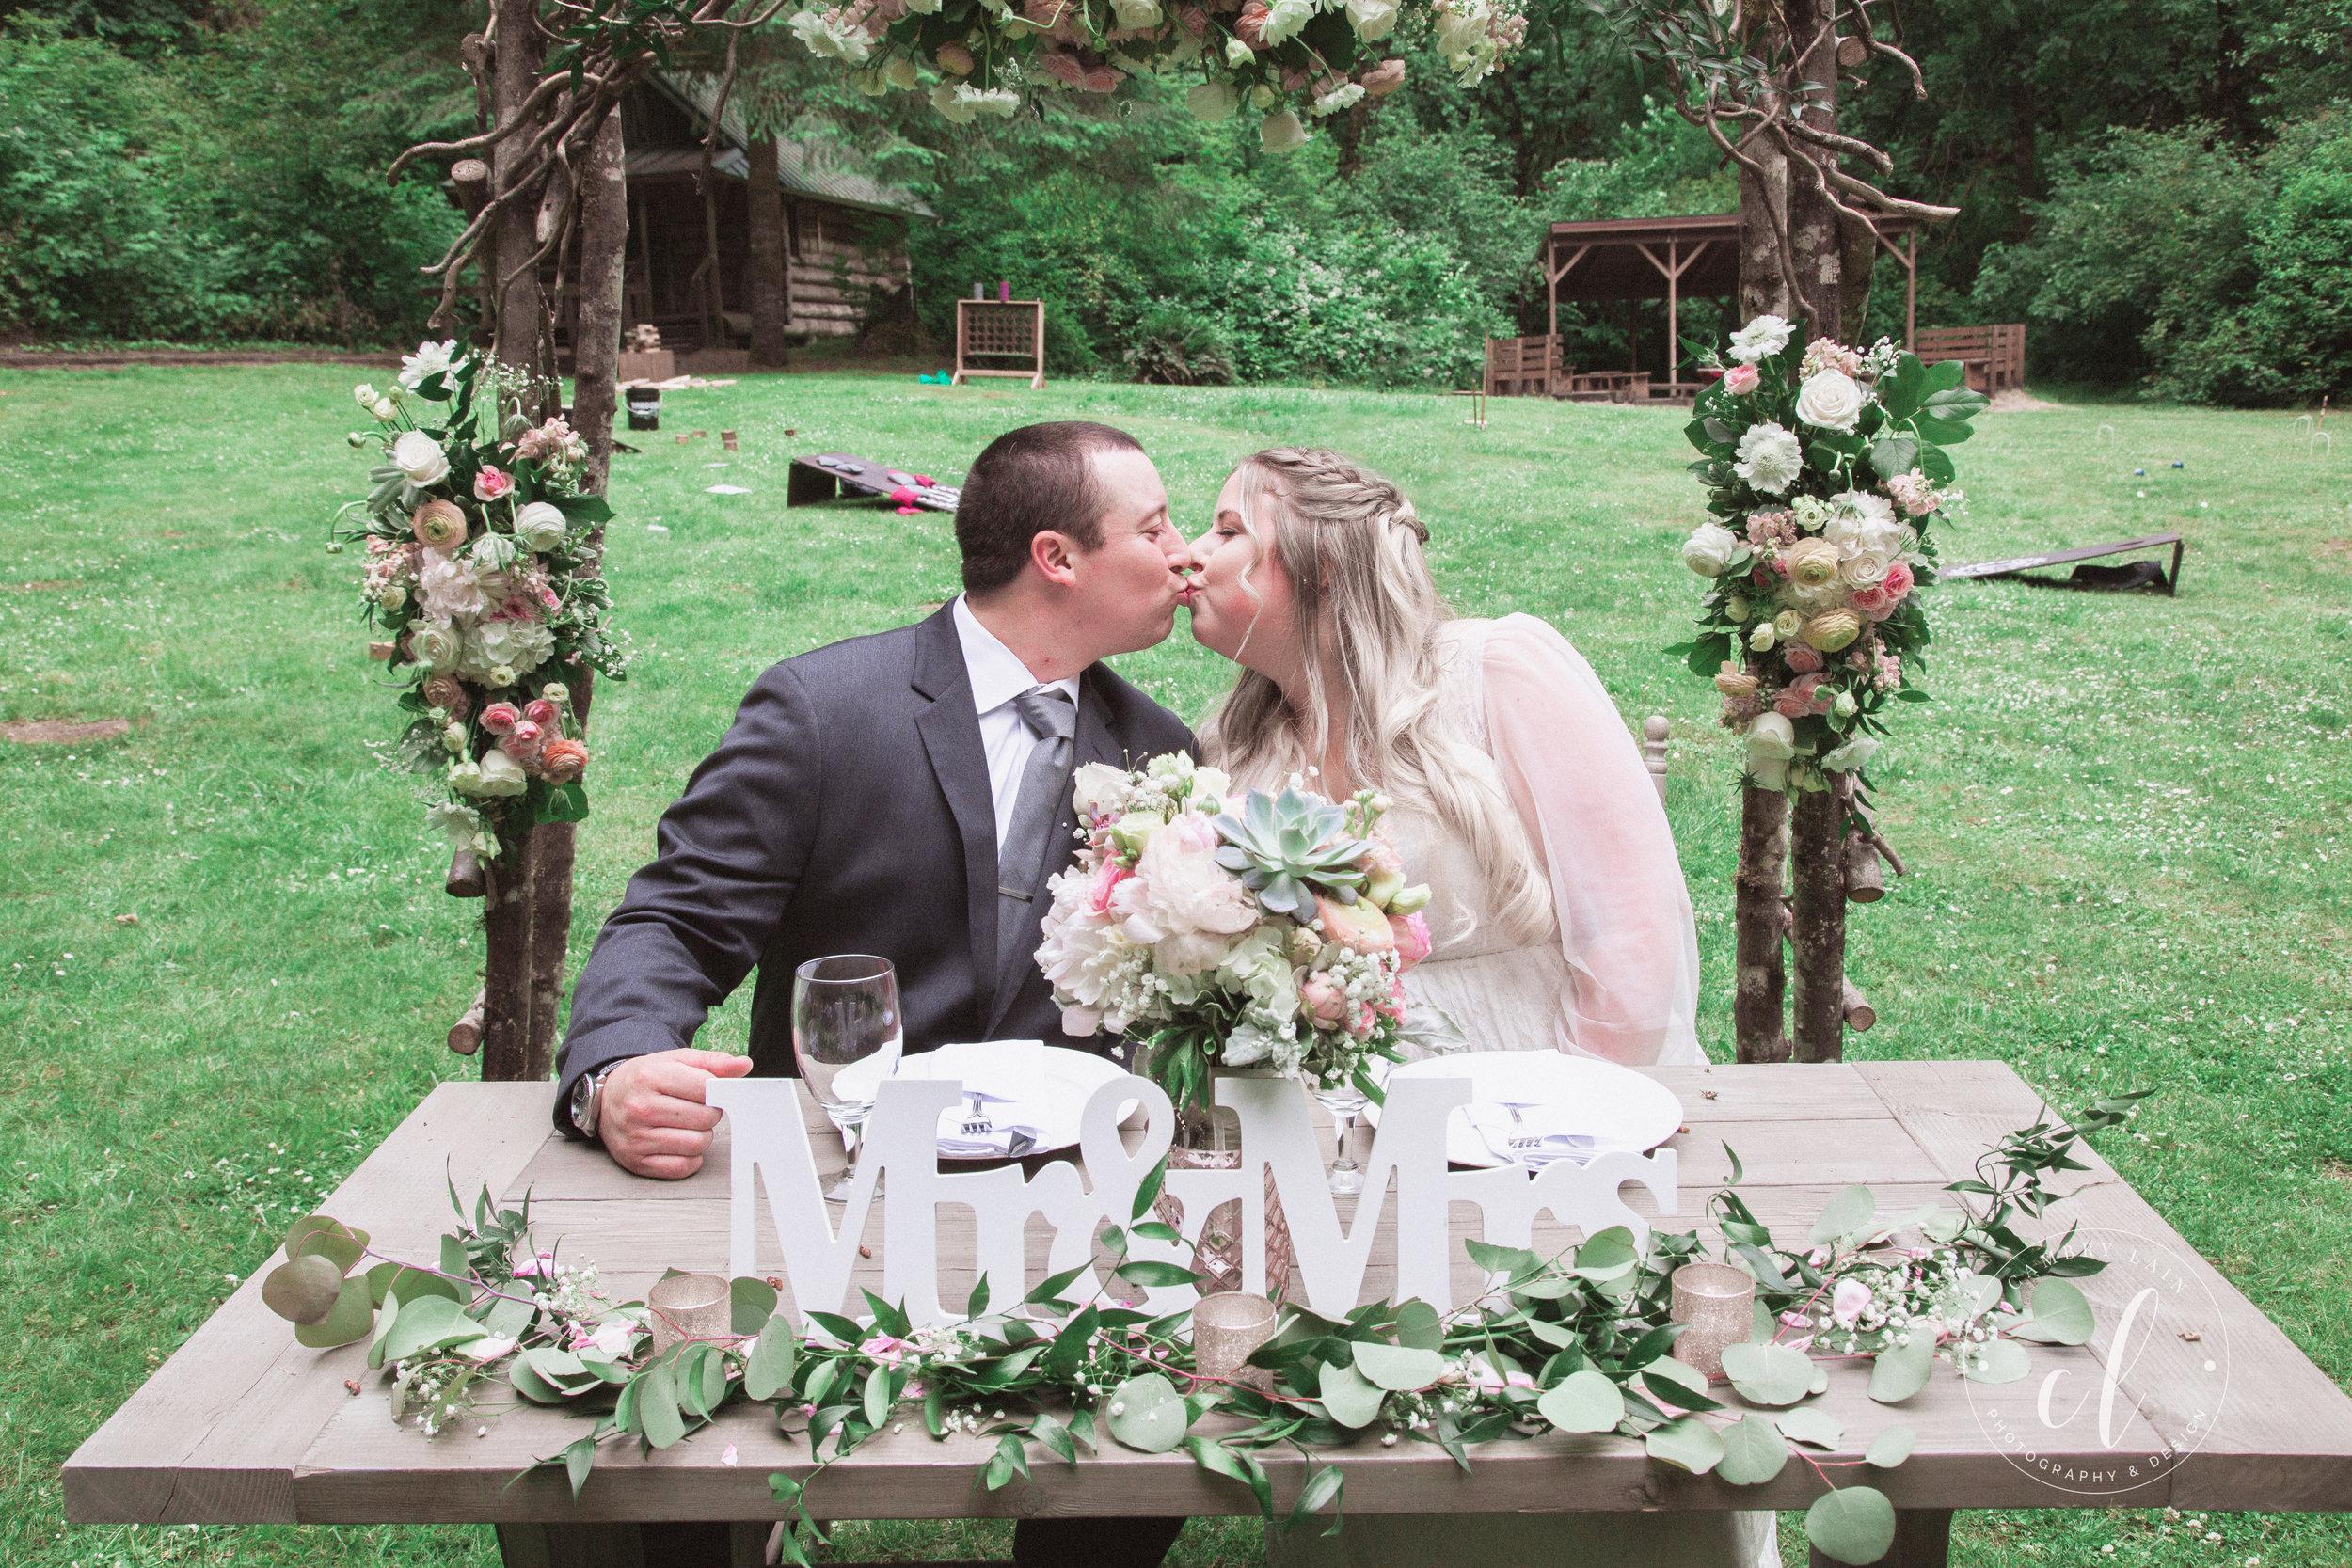 Magness-Tree-Farm-Wedding-Oregon-Wedding-Photographer-Cambry-Lain-PhotographyMagness-Tree-Farm-Wedding-Oregon-Wedding-Photographer-Cambry-Lain-Photography